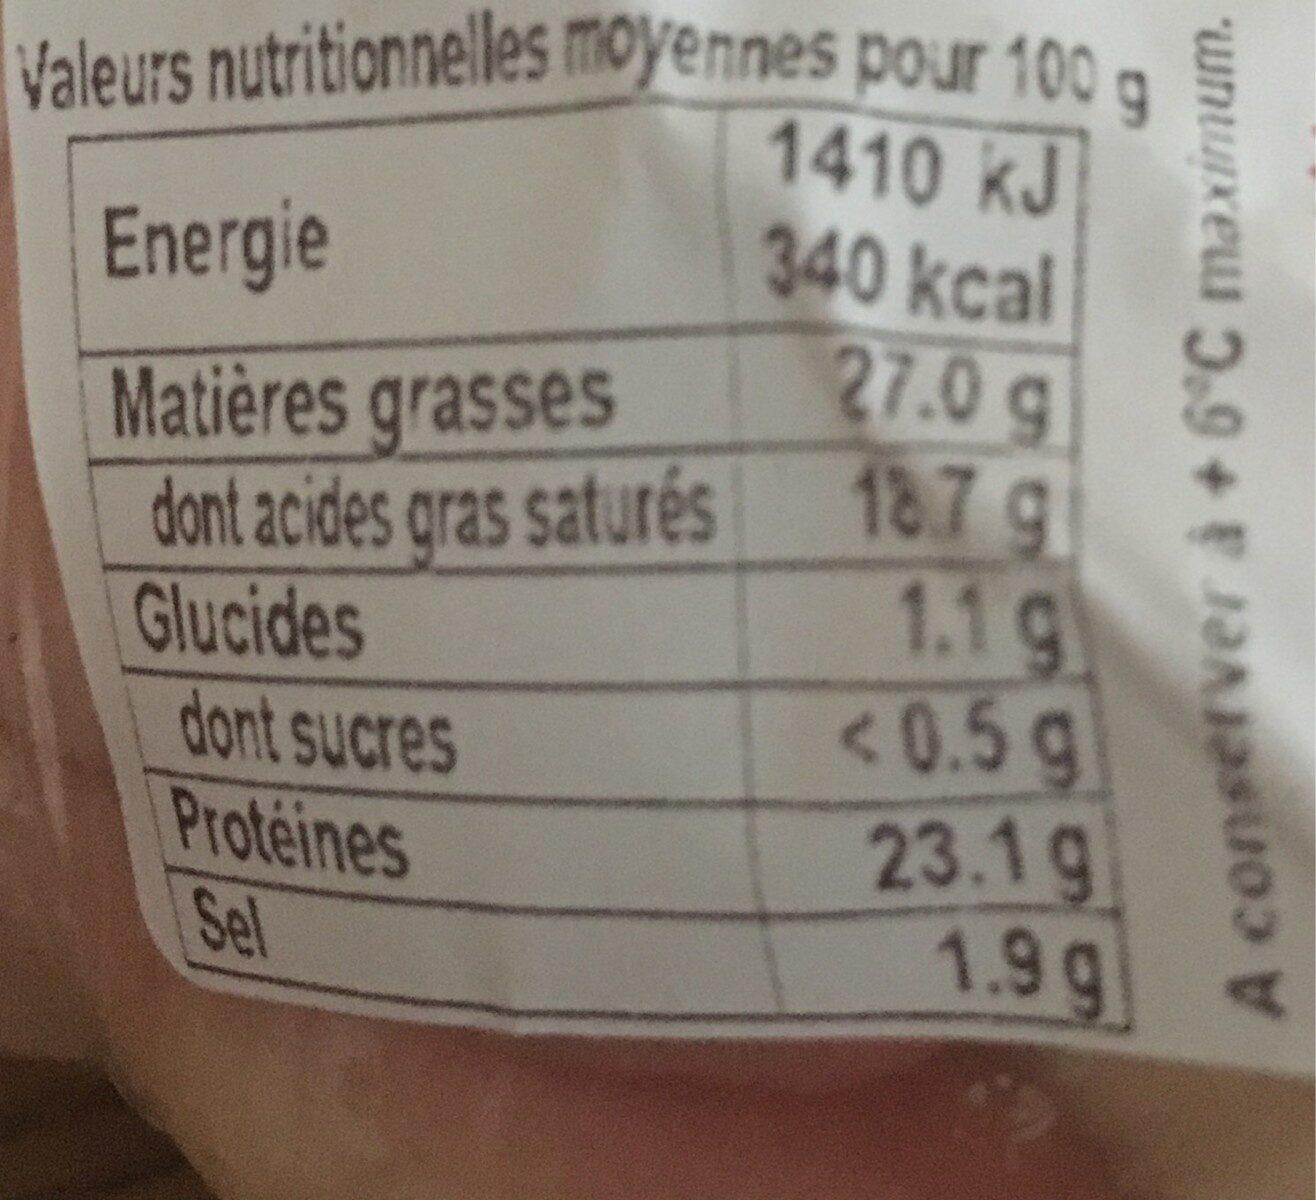 Saint nectaire - Nutrition facts